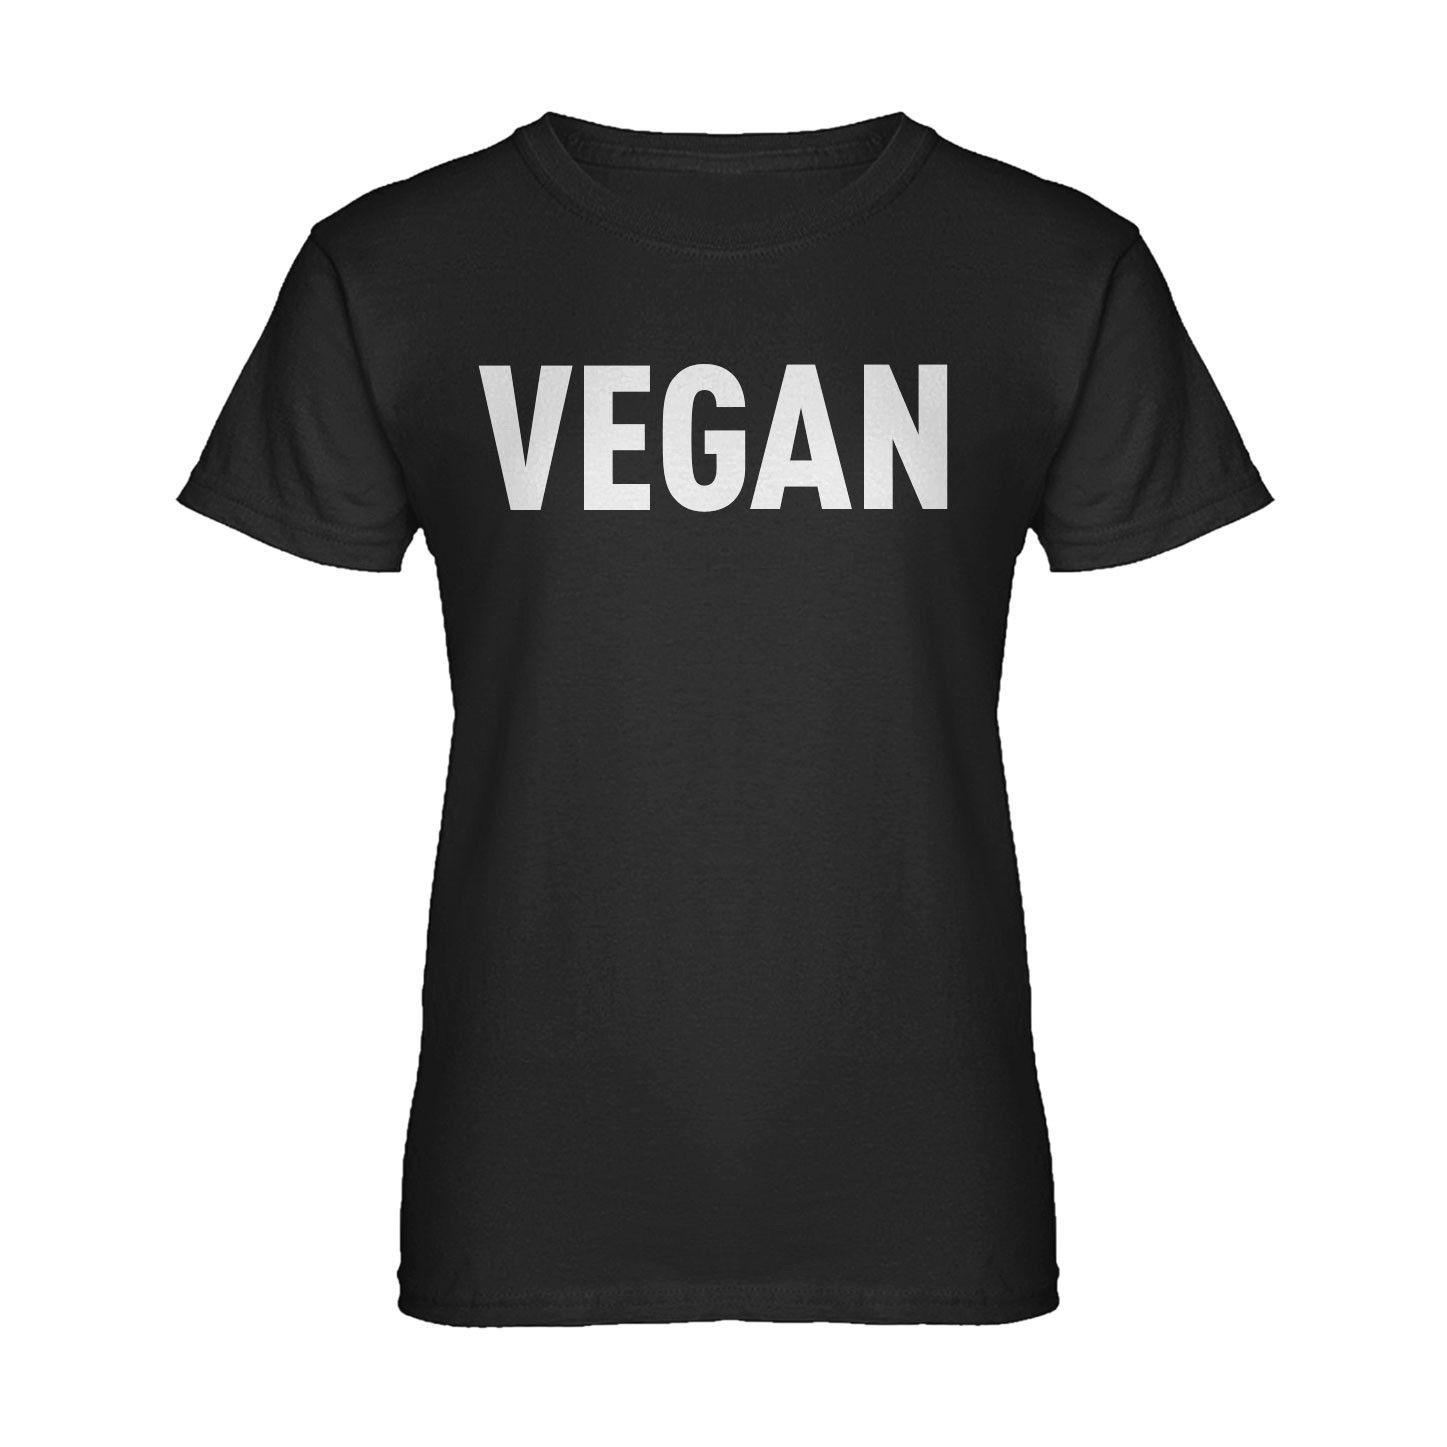 Womens vegan ladiesu tshirt unisex and products